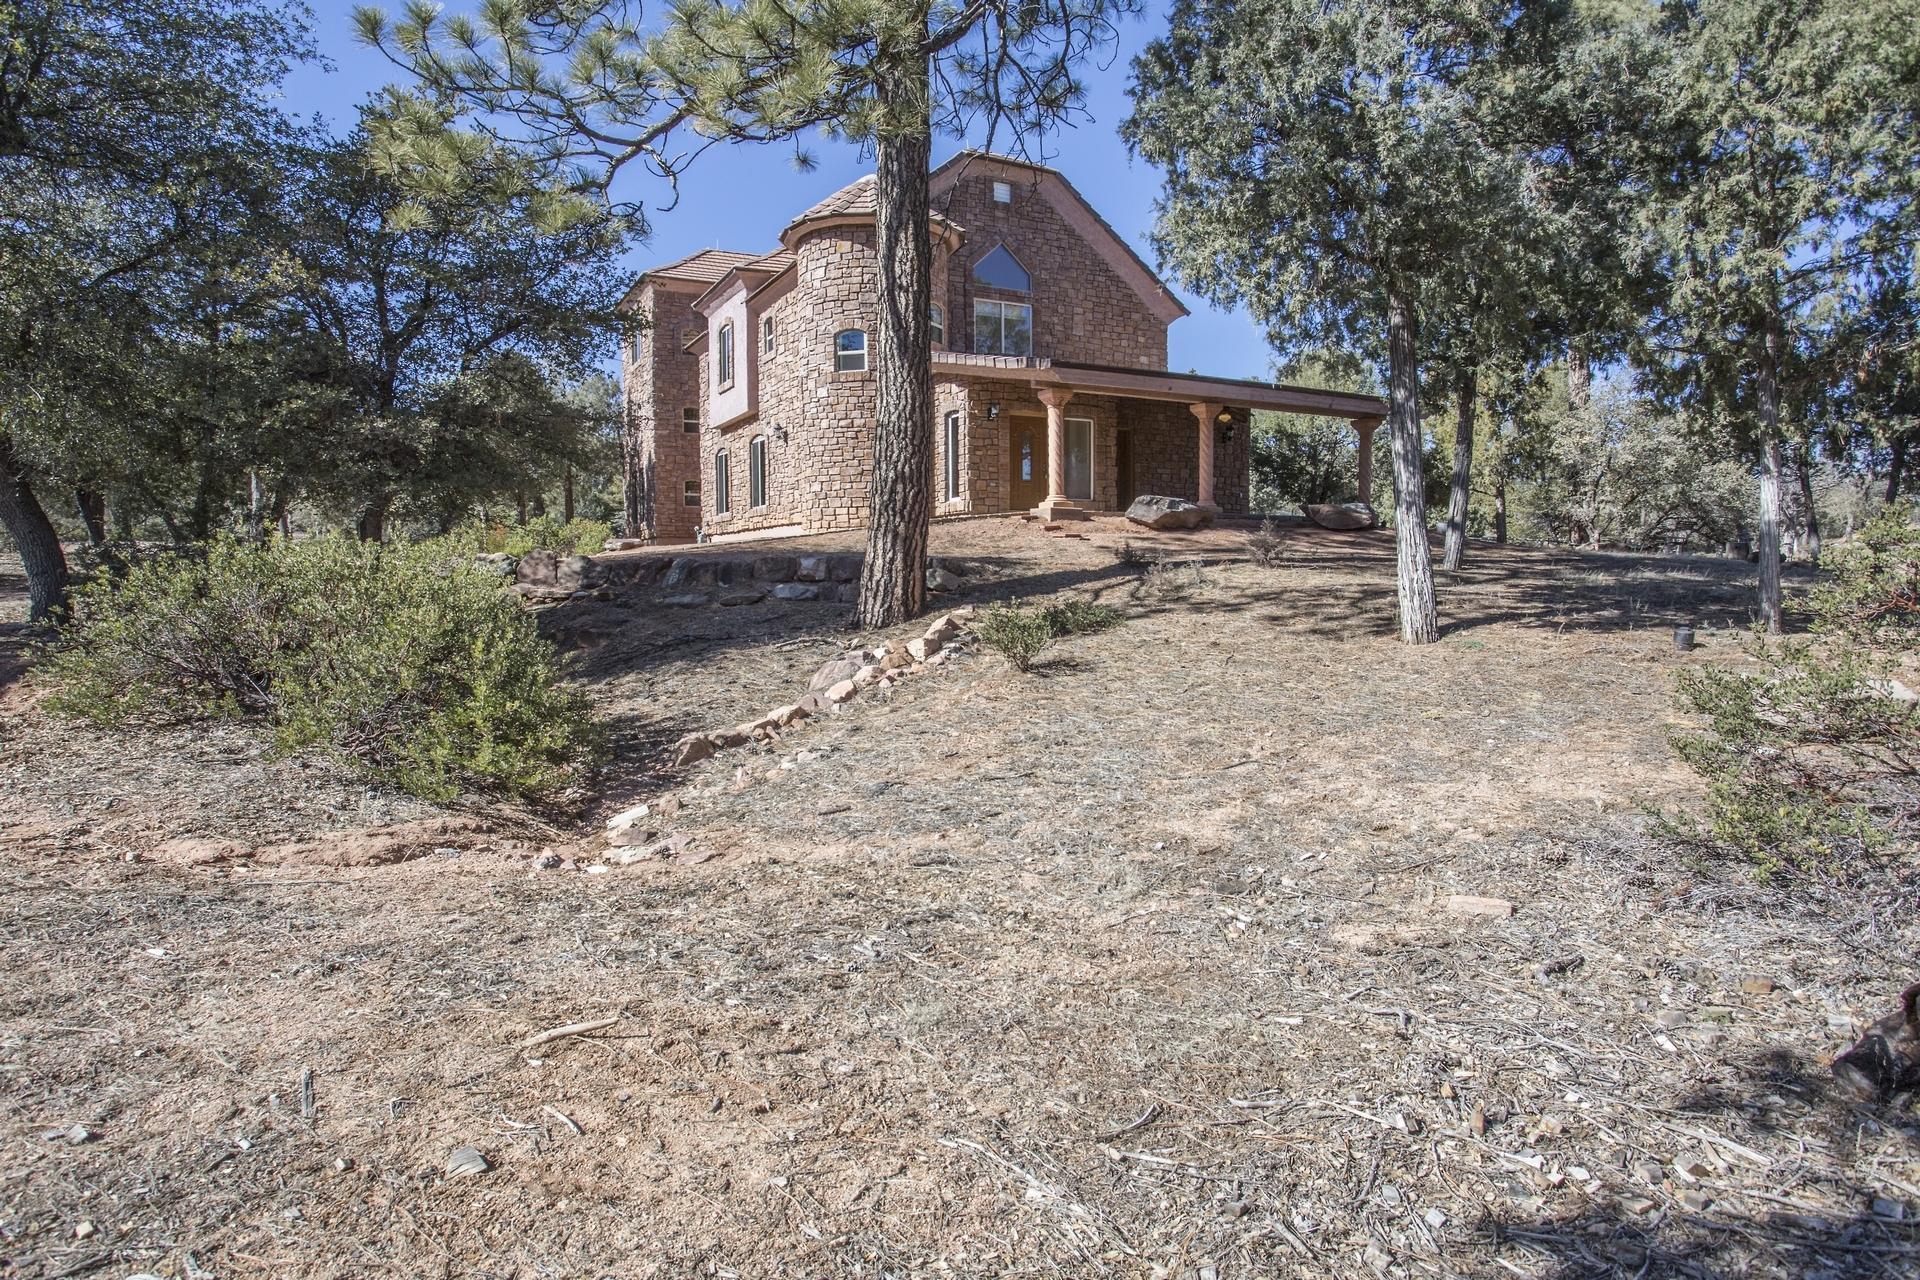 Photo of 1804 E Underwood, Payson, AZ 85541